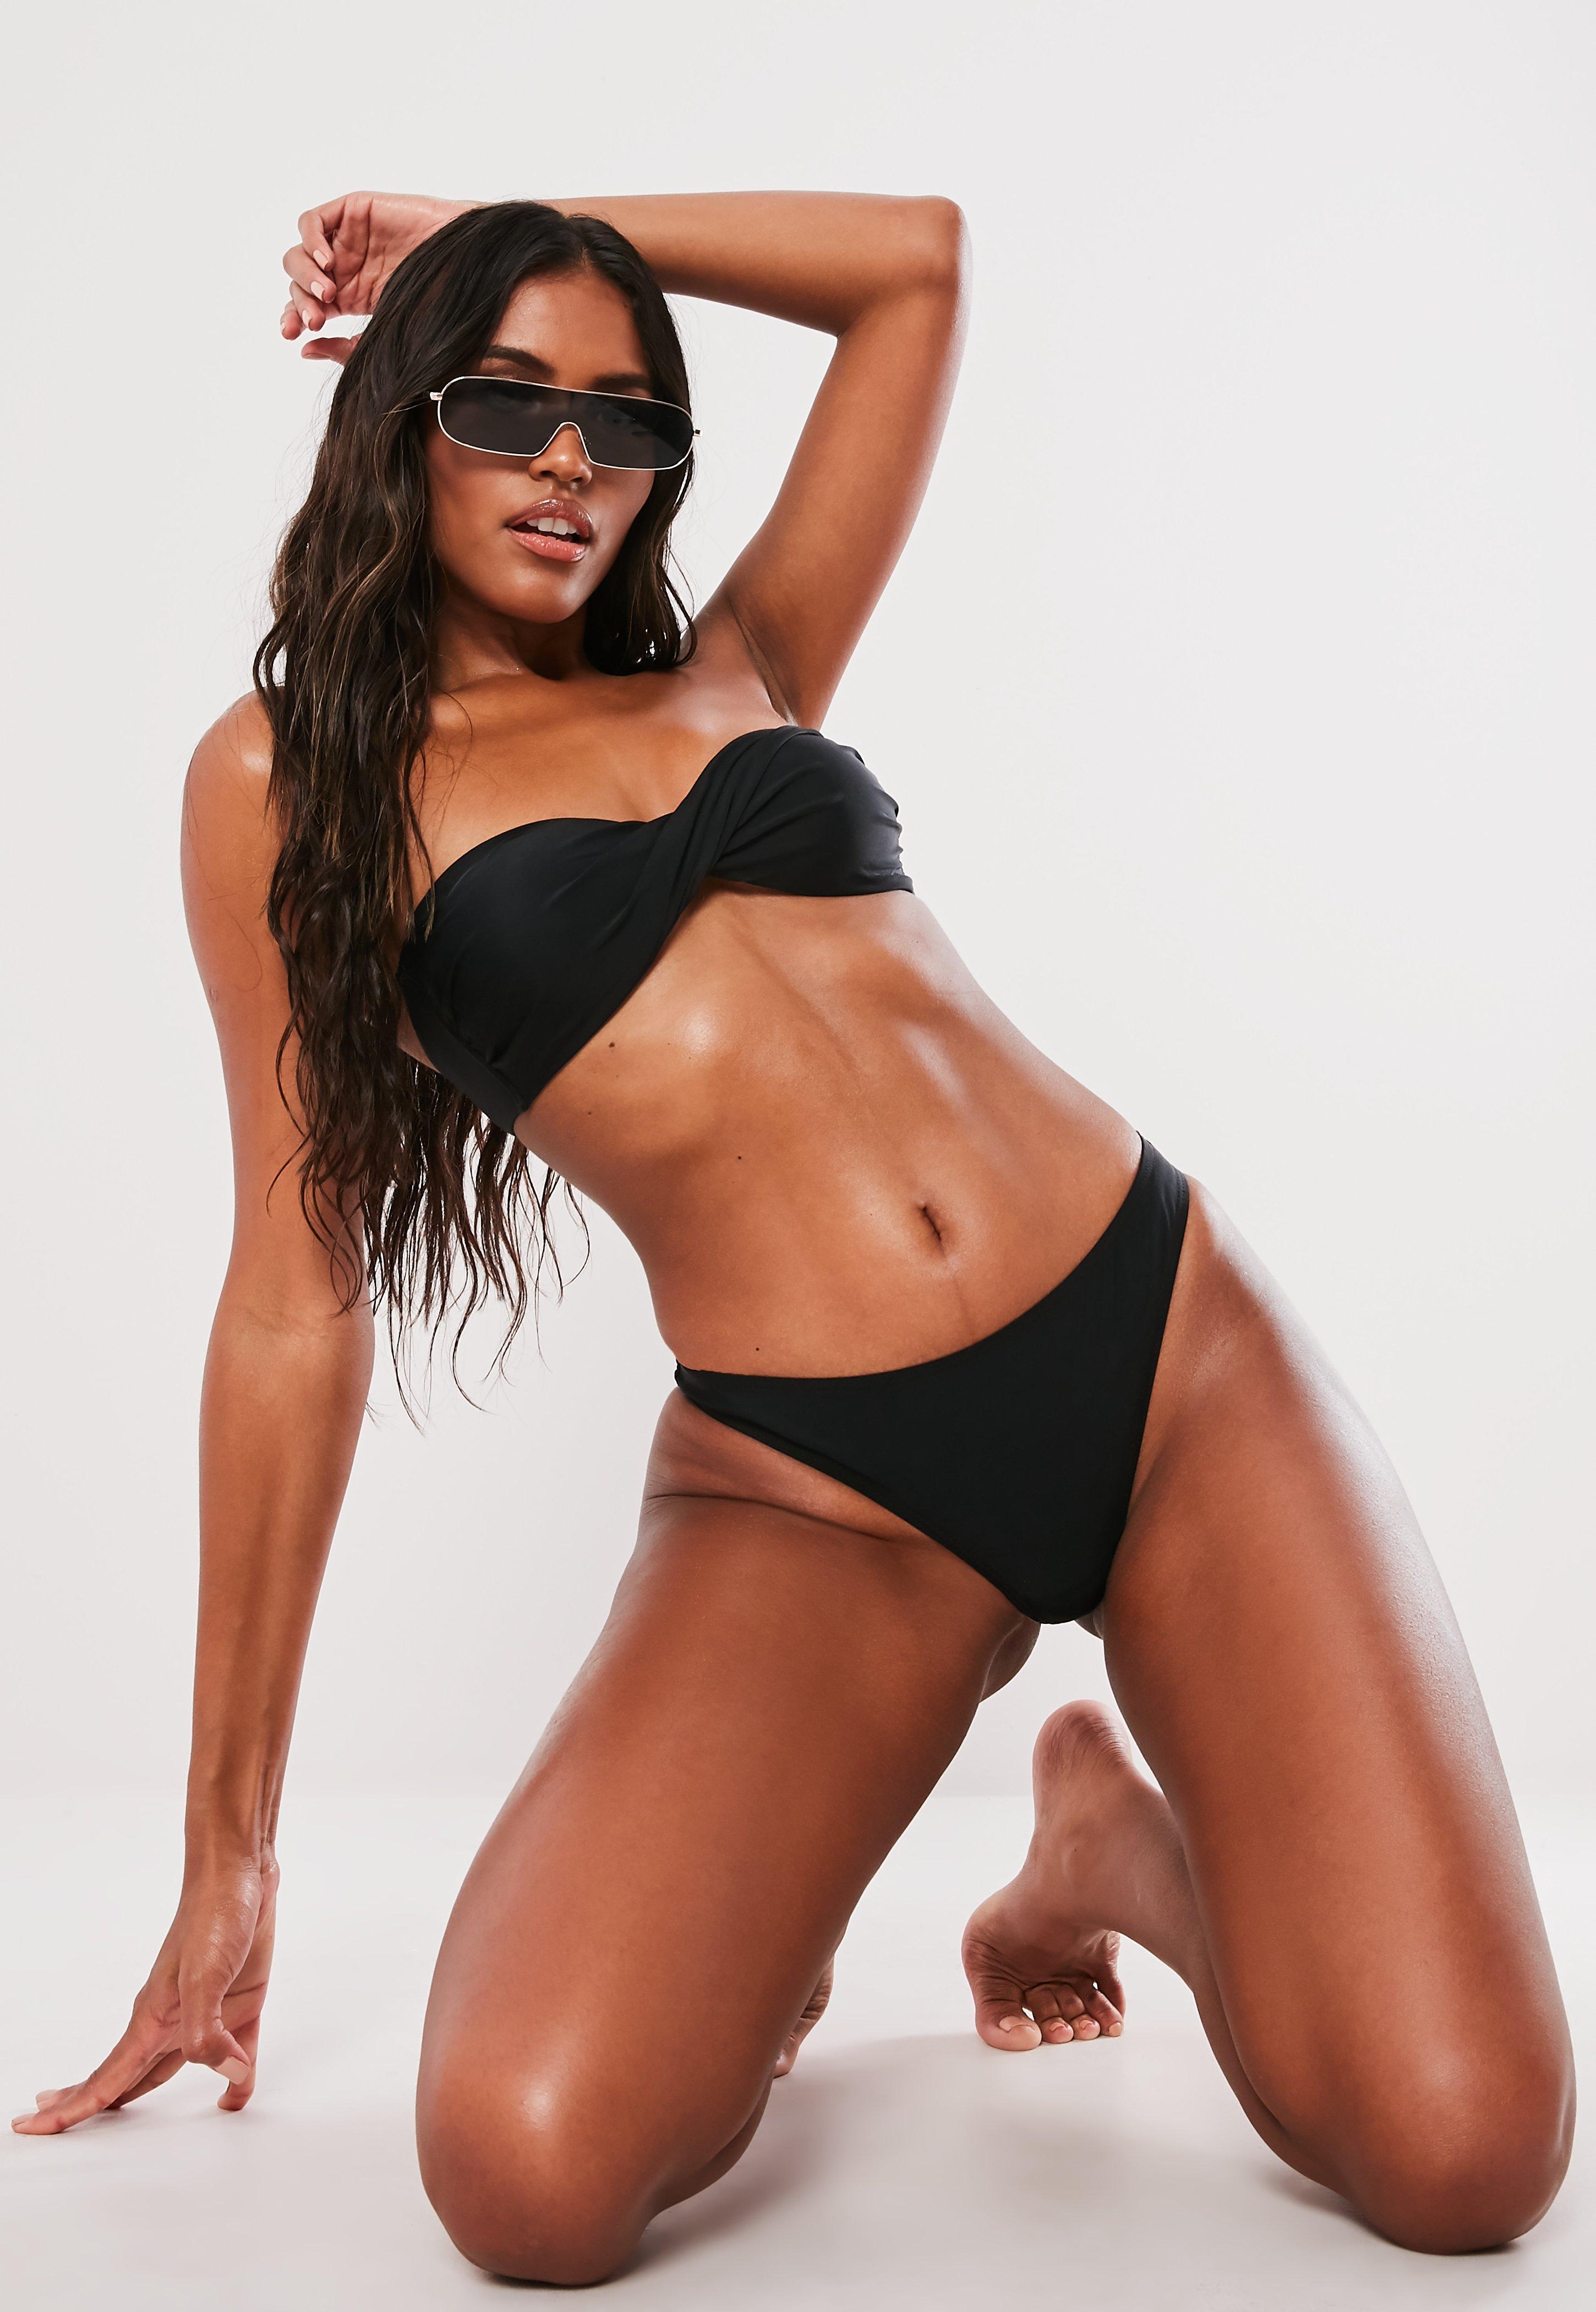 Strapless bikini pictures